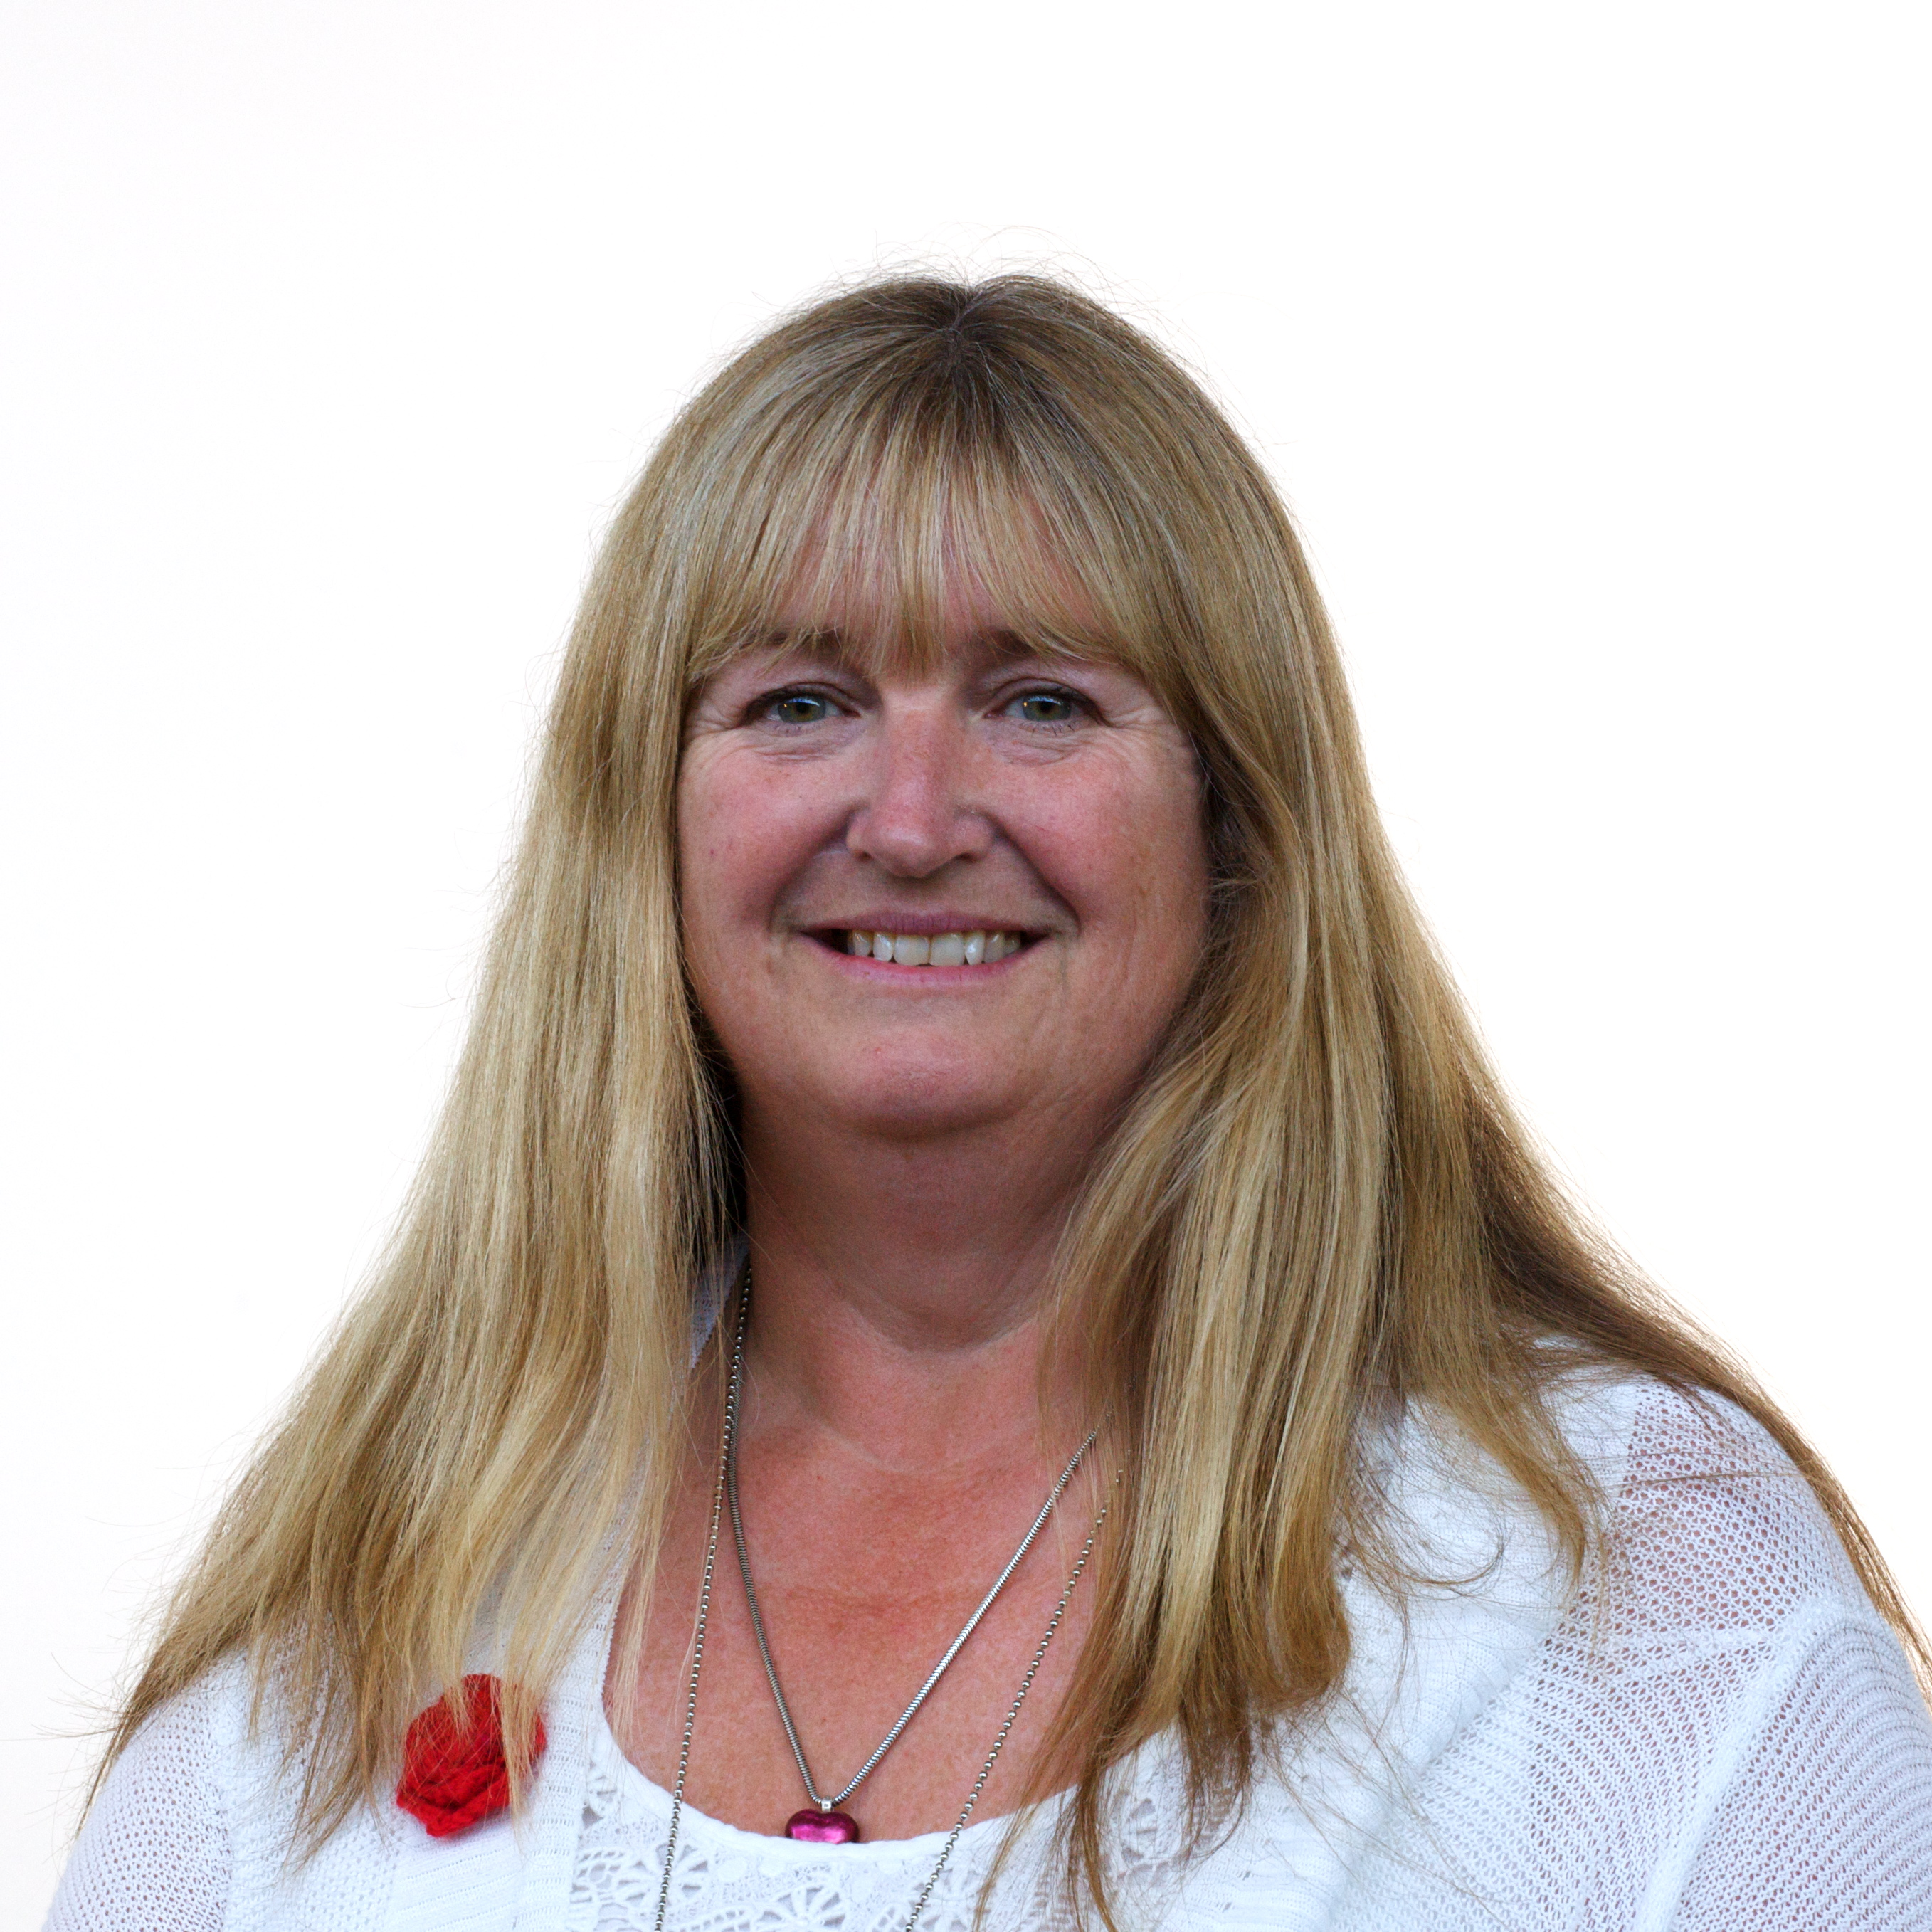 Portrait of Julie James